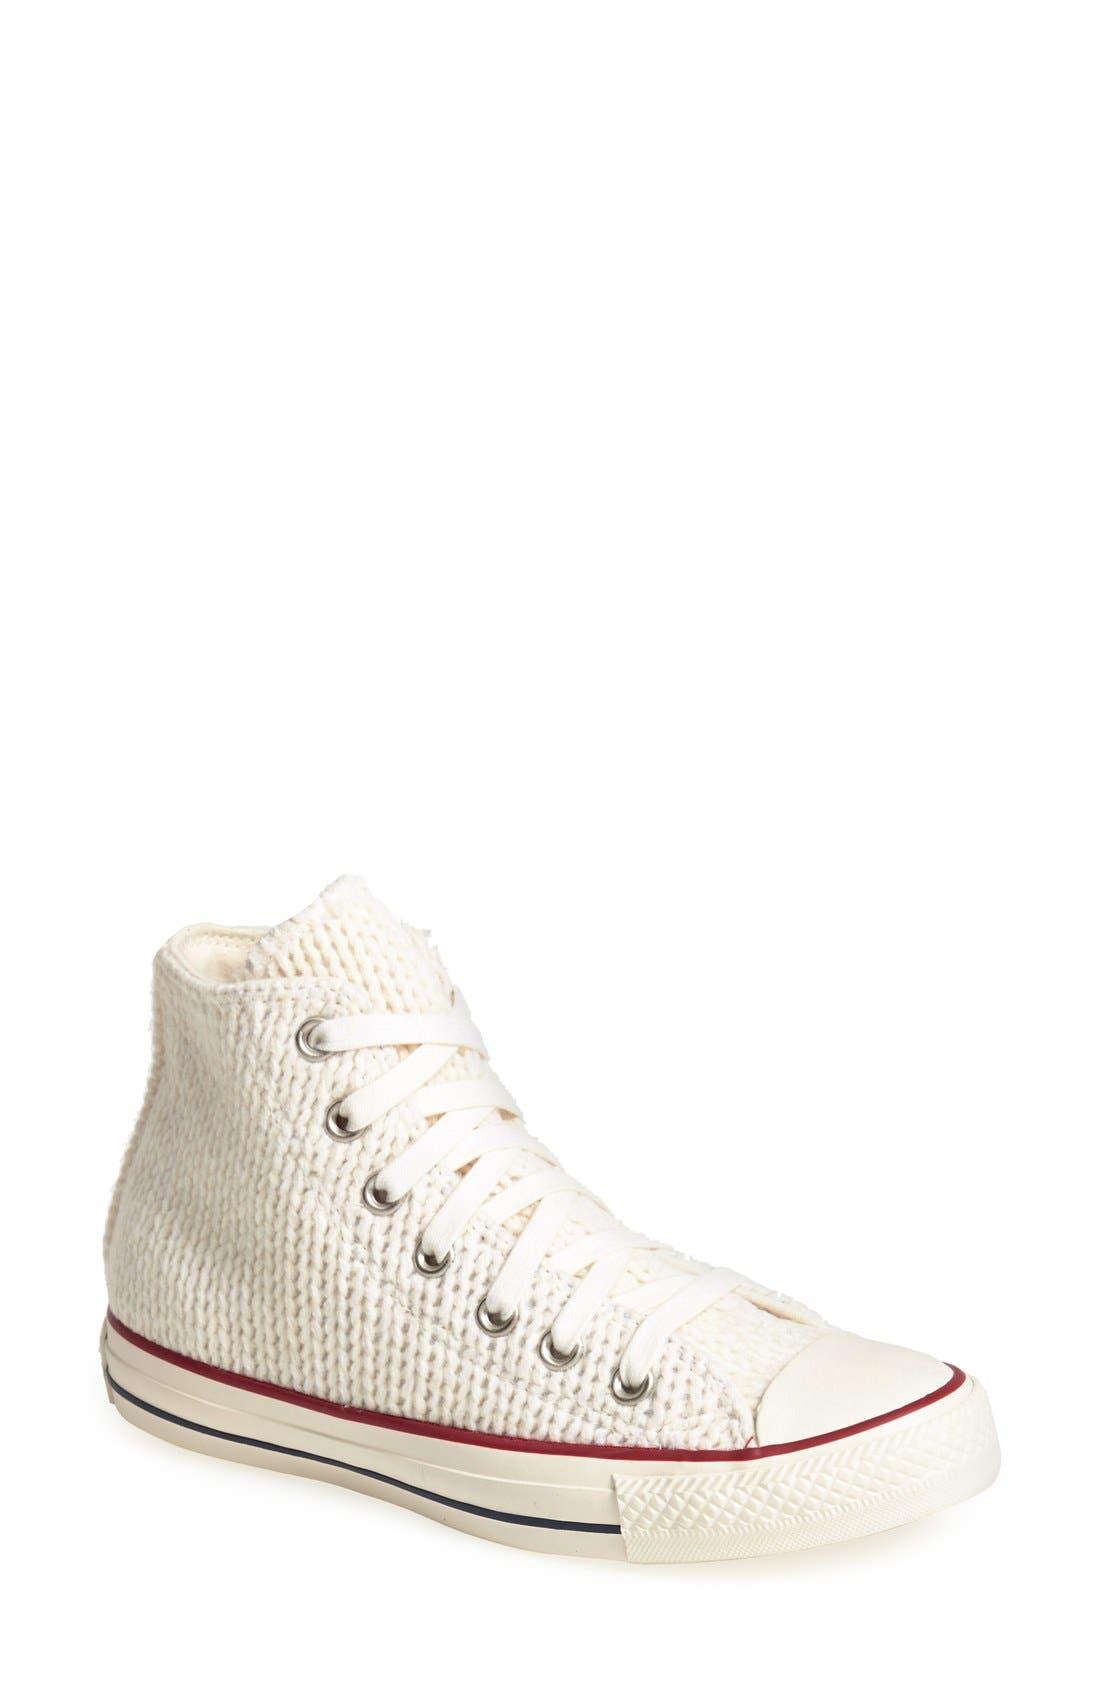 Main Image - Converse Chuck Taylor® All Star® 'Winter Knit' High Top Sneaker (Women)